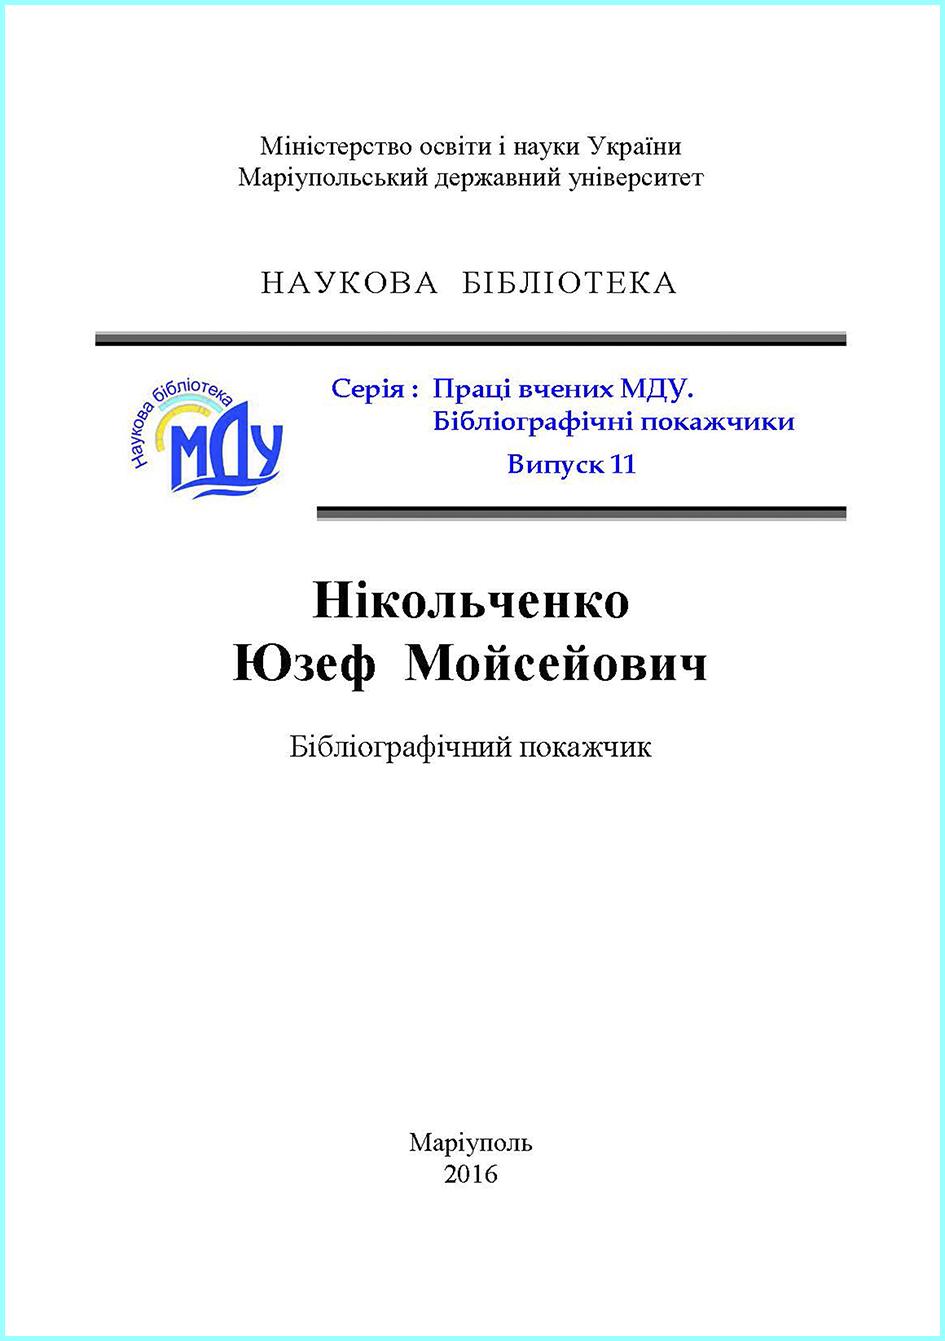 Nikolchenko